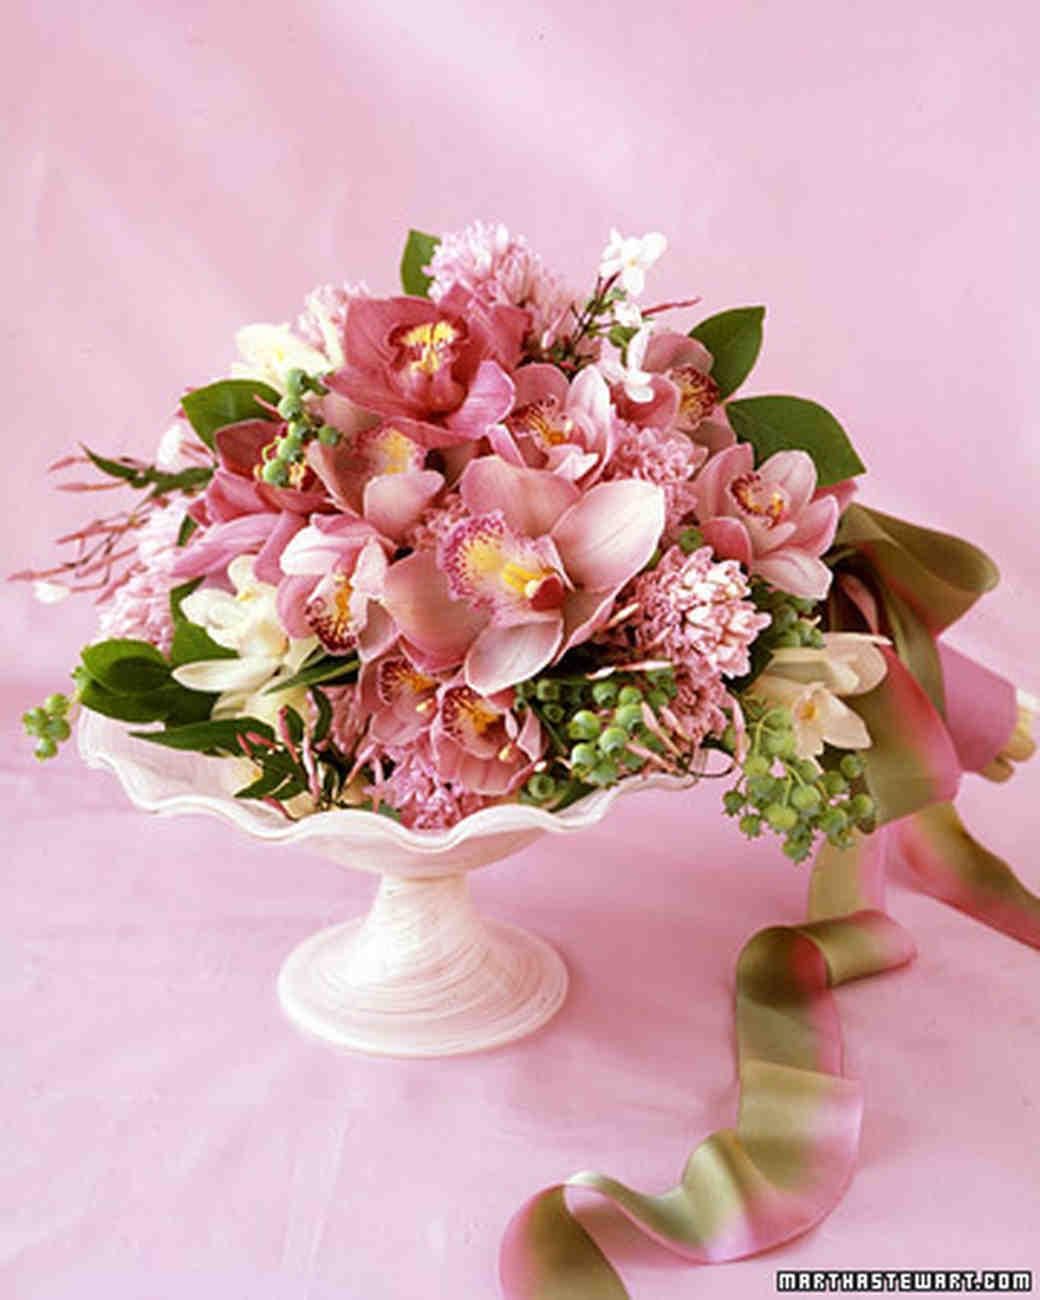 Orchid Flower Arrangements For Weddings: Martha Stewart Weddings